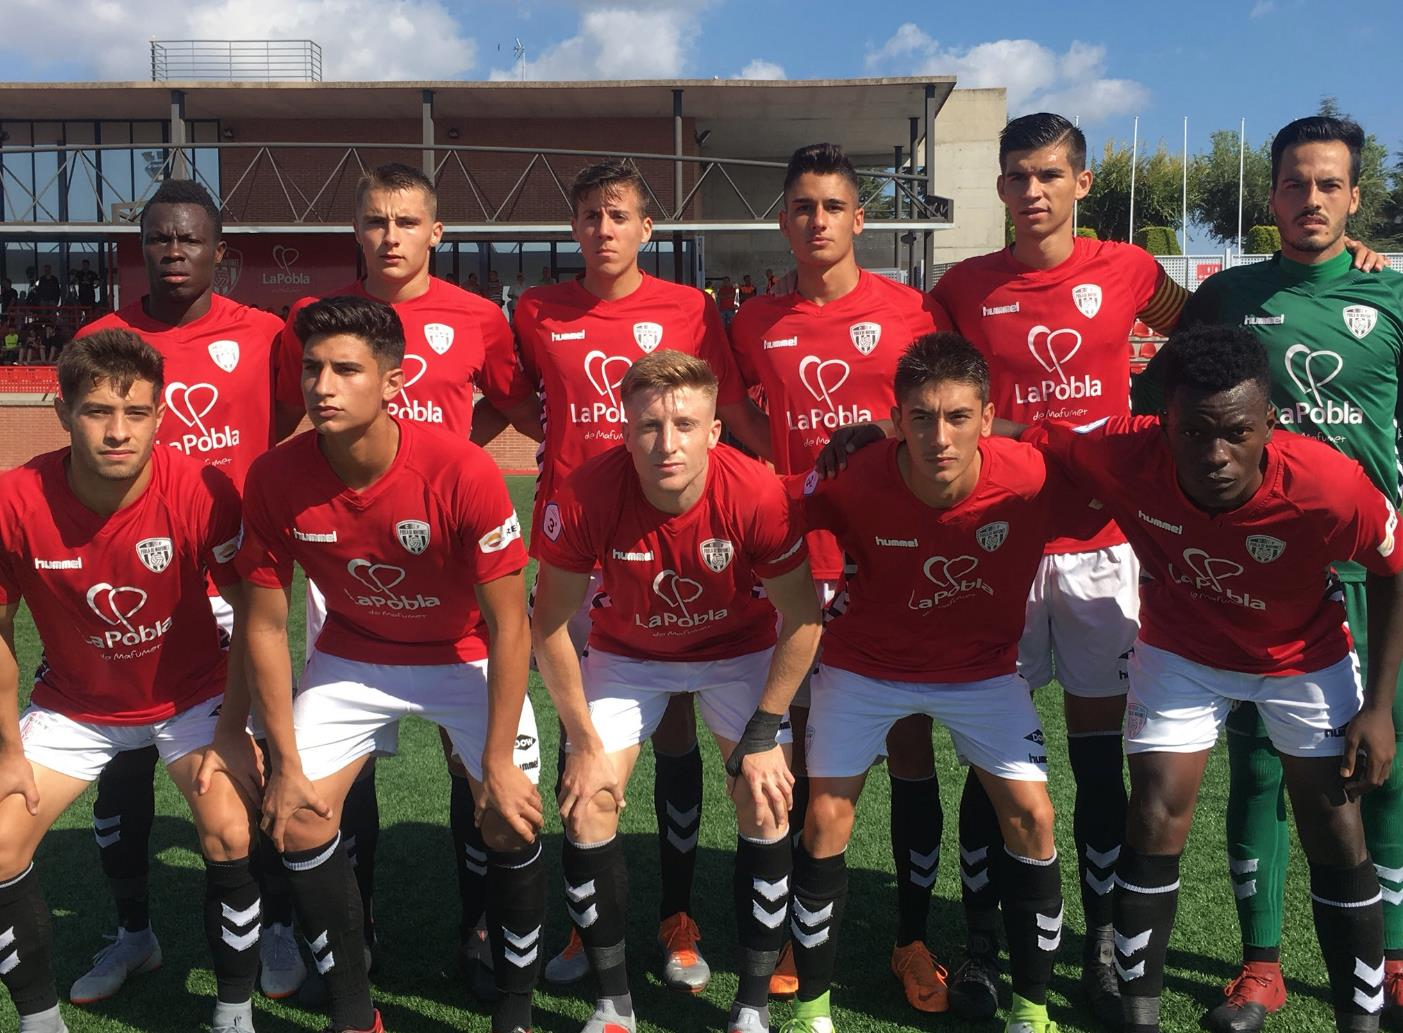 Victòria del CF Pobla de Mafumet al Santfeliuenc FC per 1-0